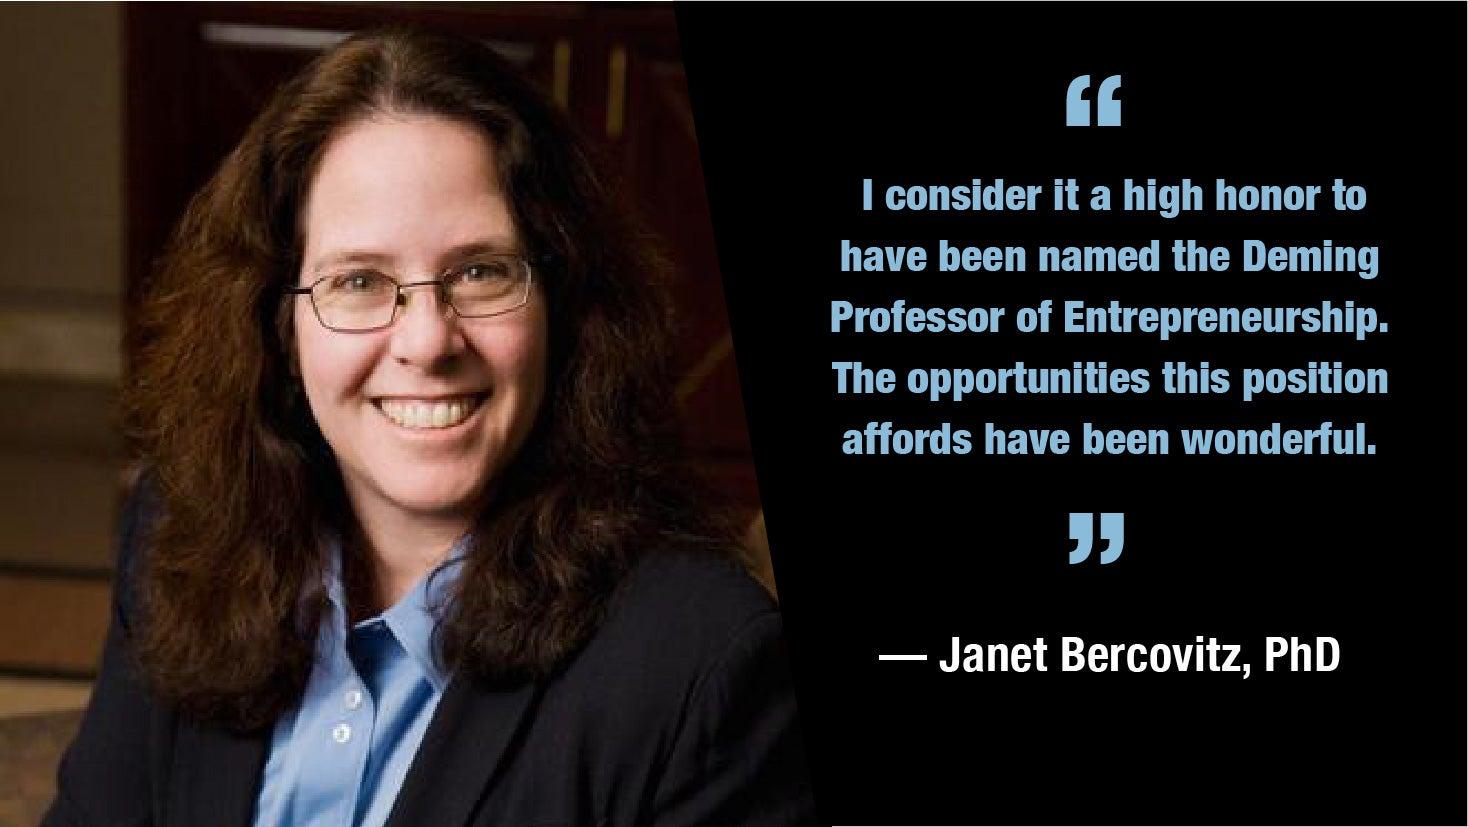 Janet Bercovitz Image